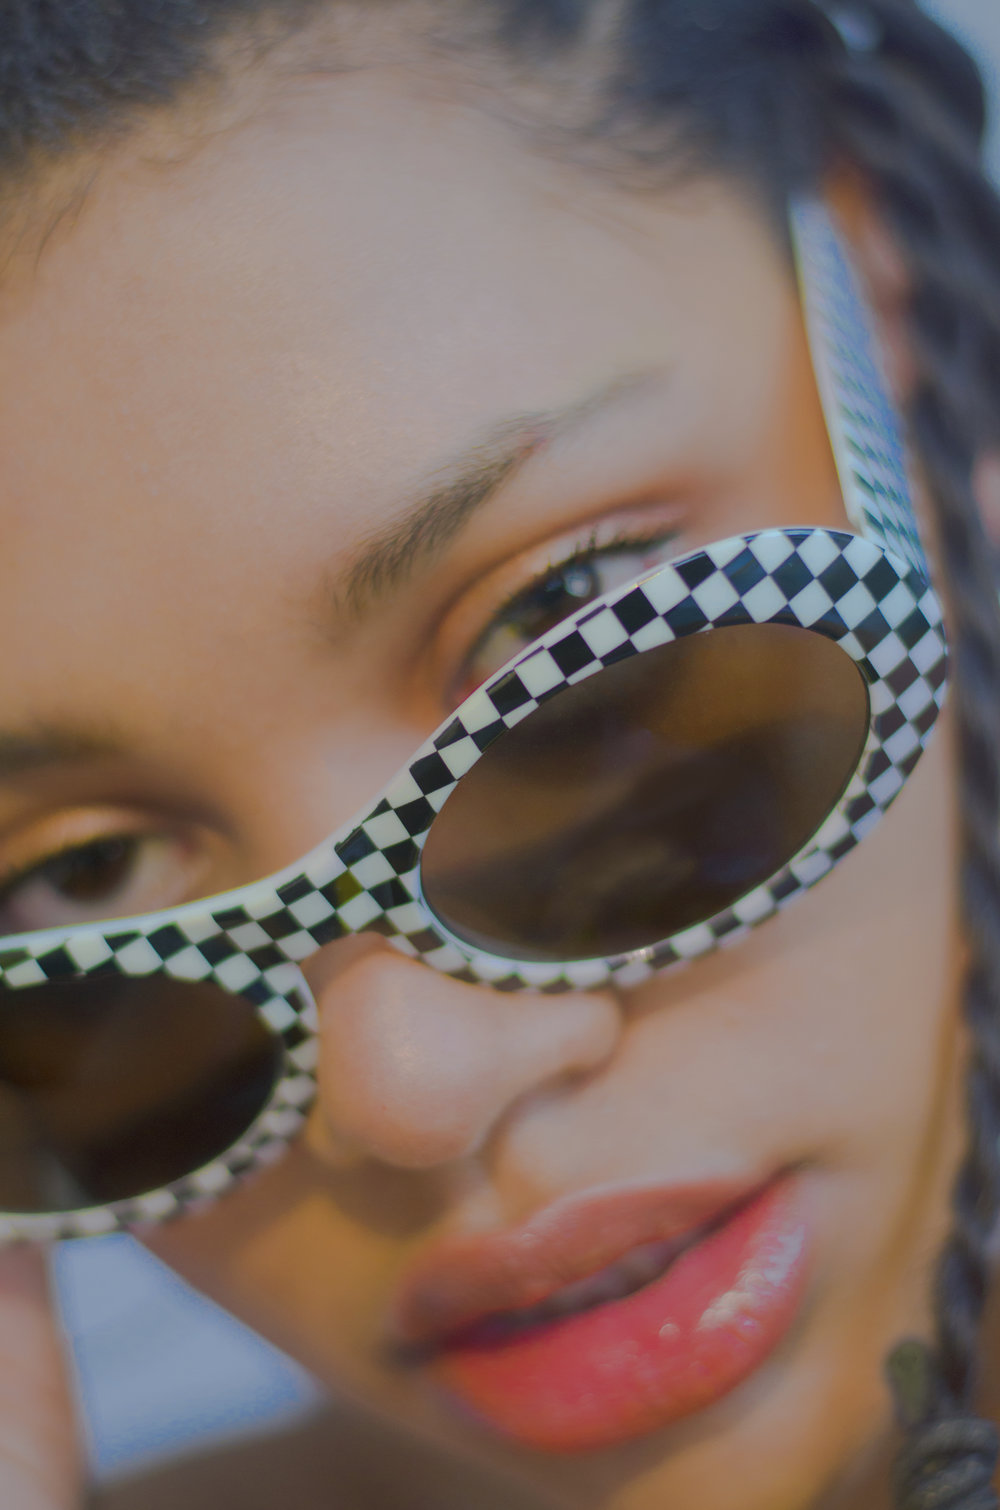 Photographer: Nwaka Okparaeke  Model: Bella Sontez  Hair Styling: Marra Kerr